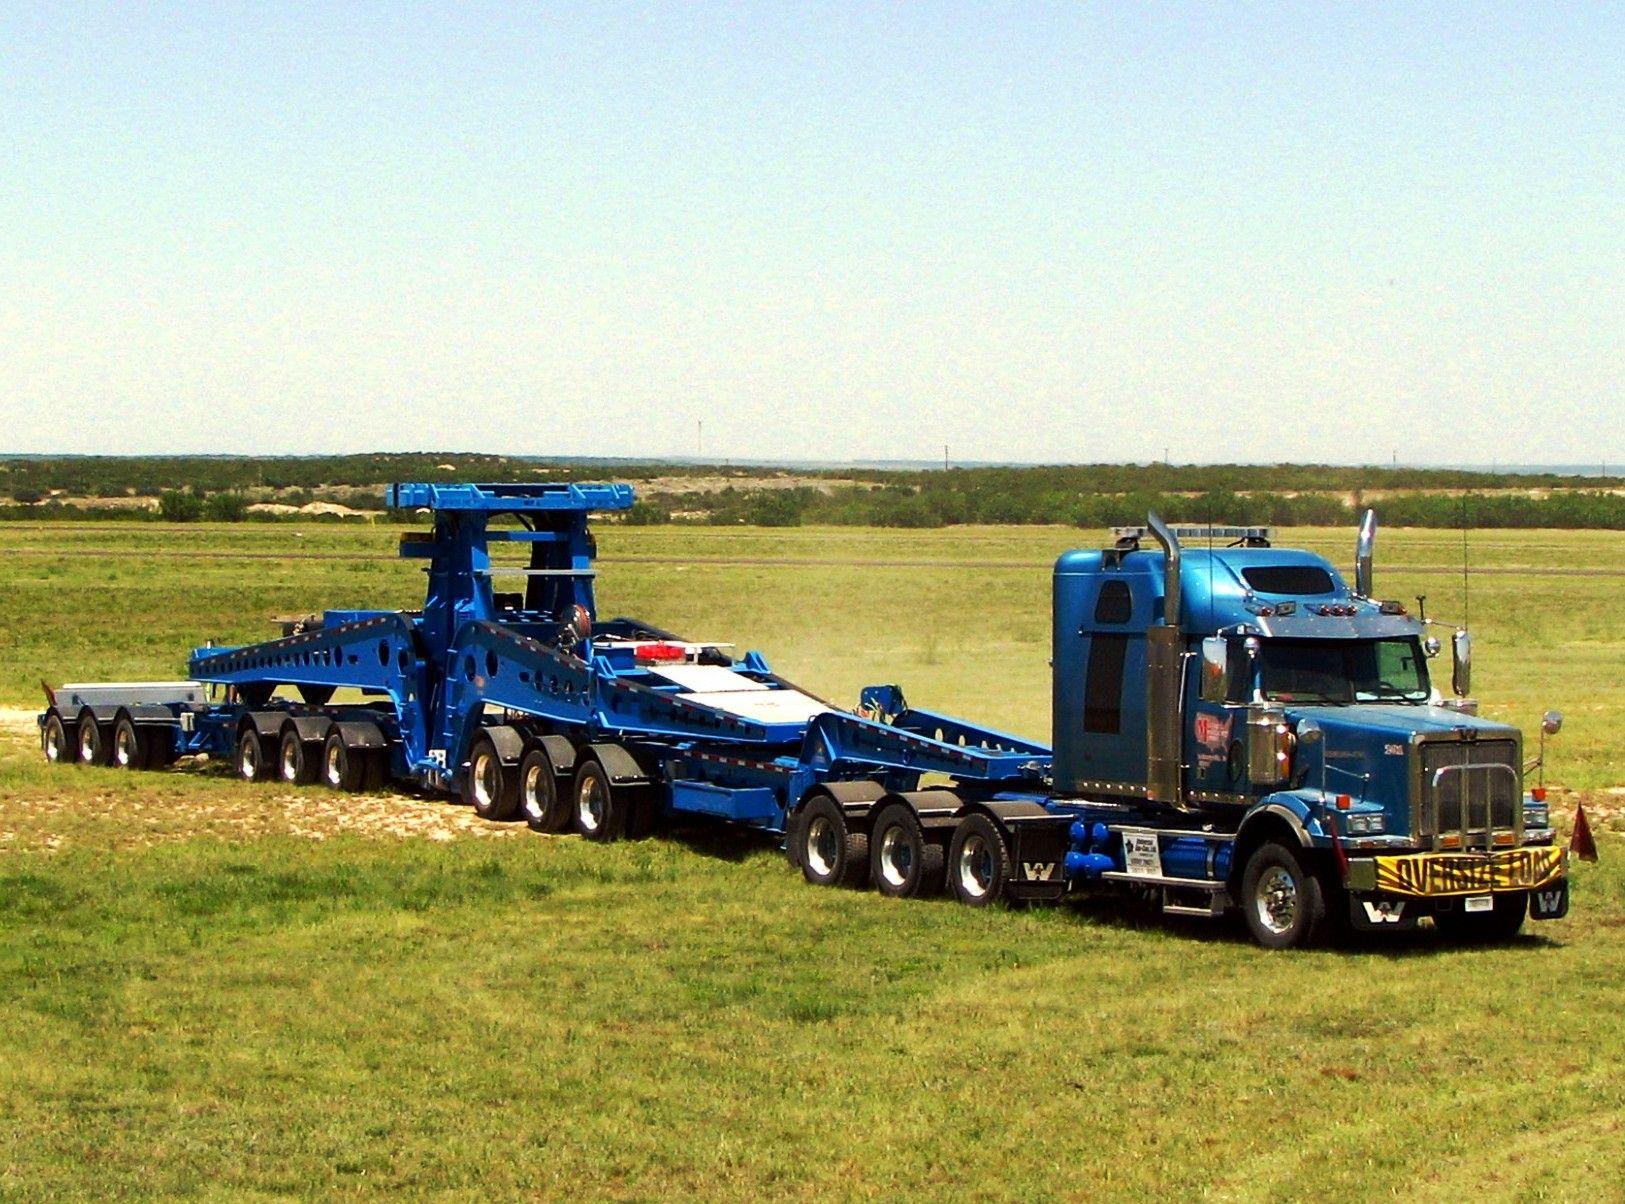 Western Star Truck Dealers Ohio Best New Trucks Western Star Trucks Trucks Big Trucks